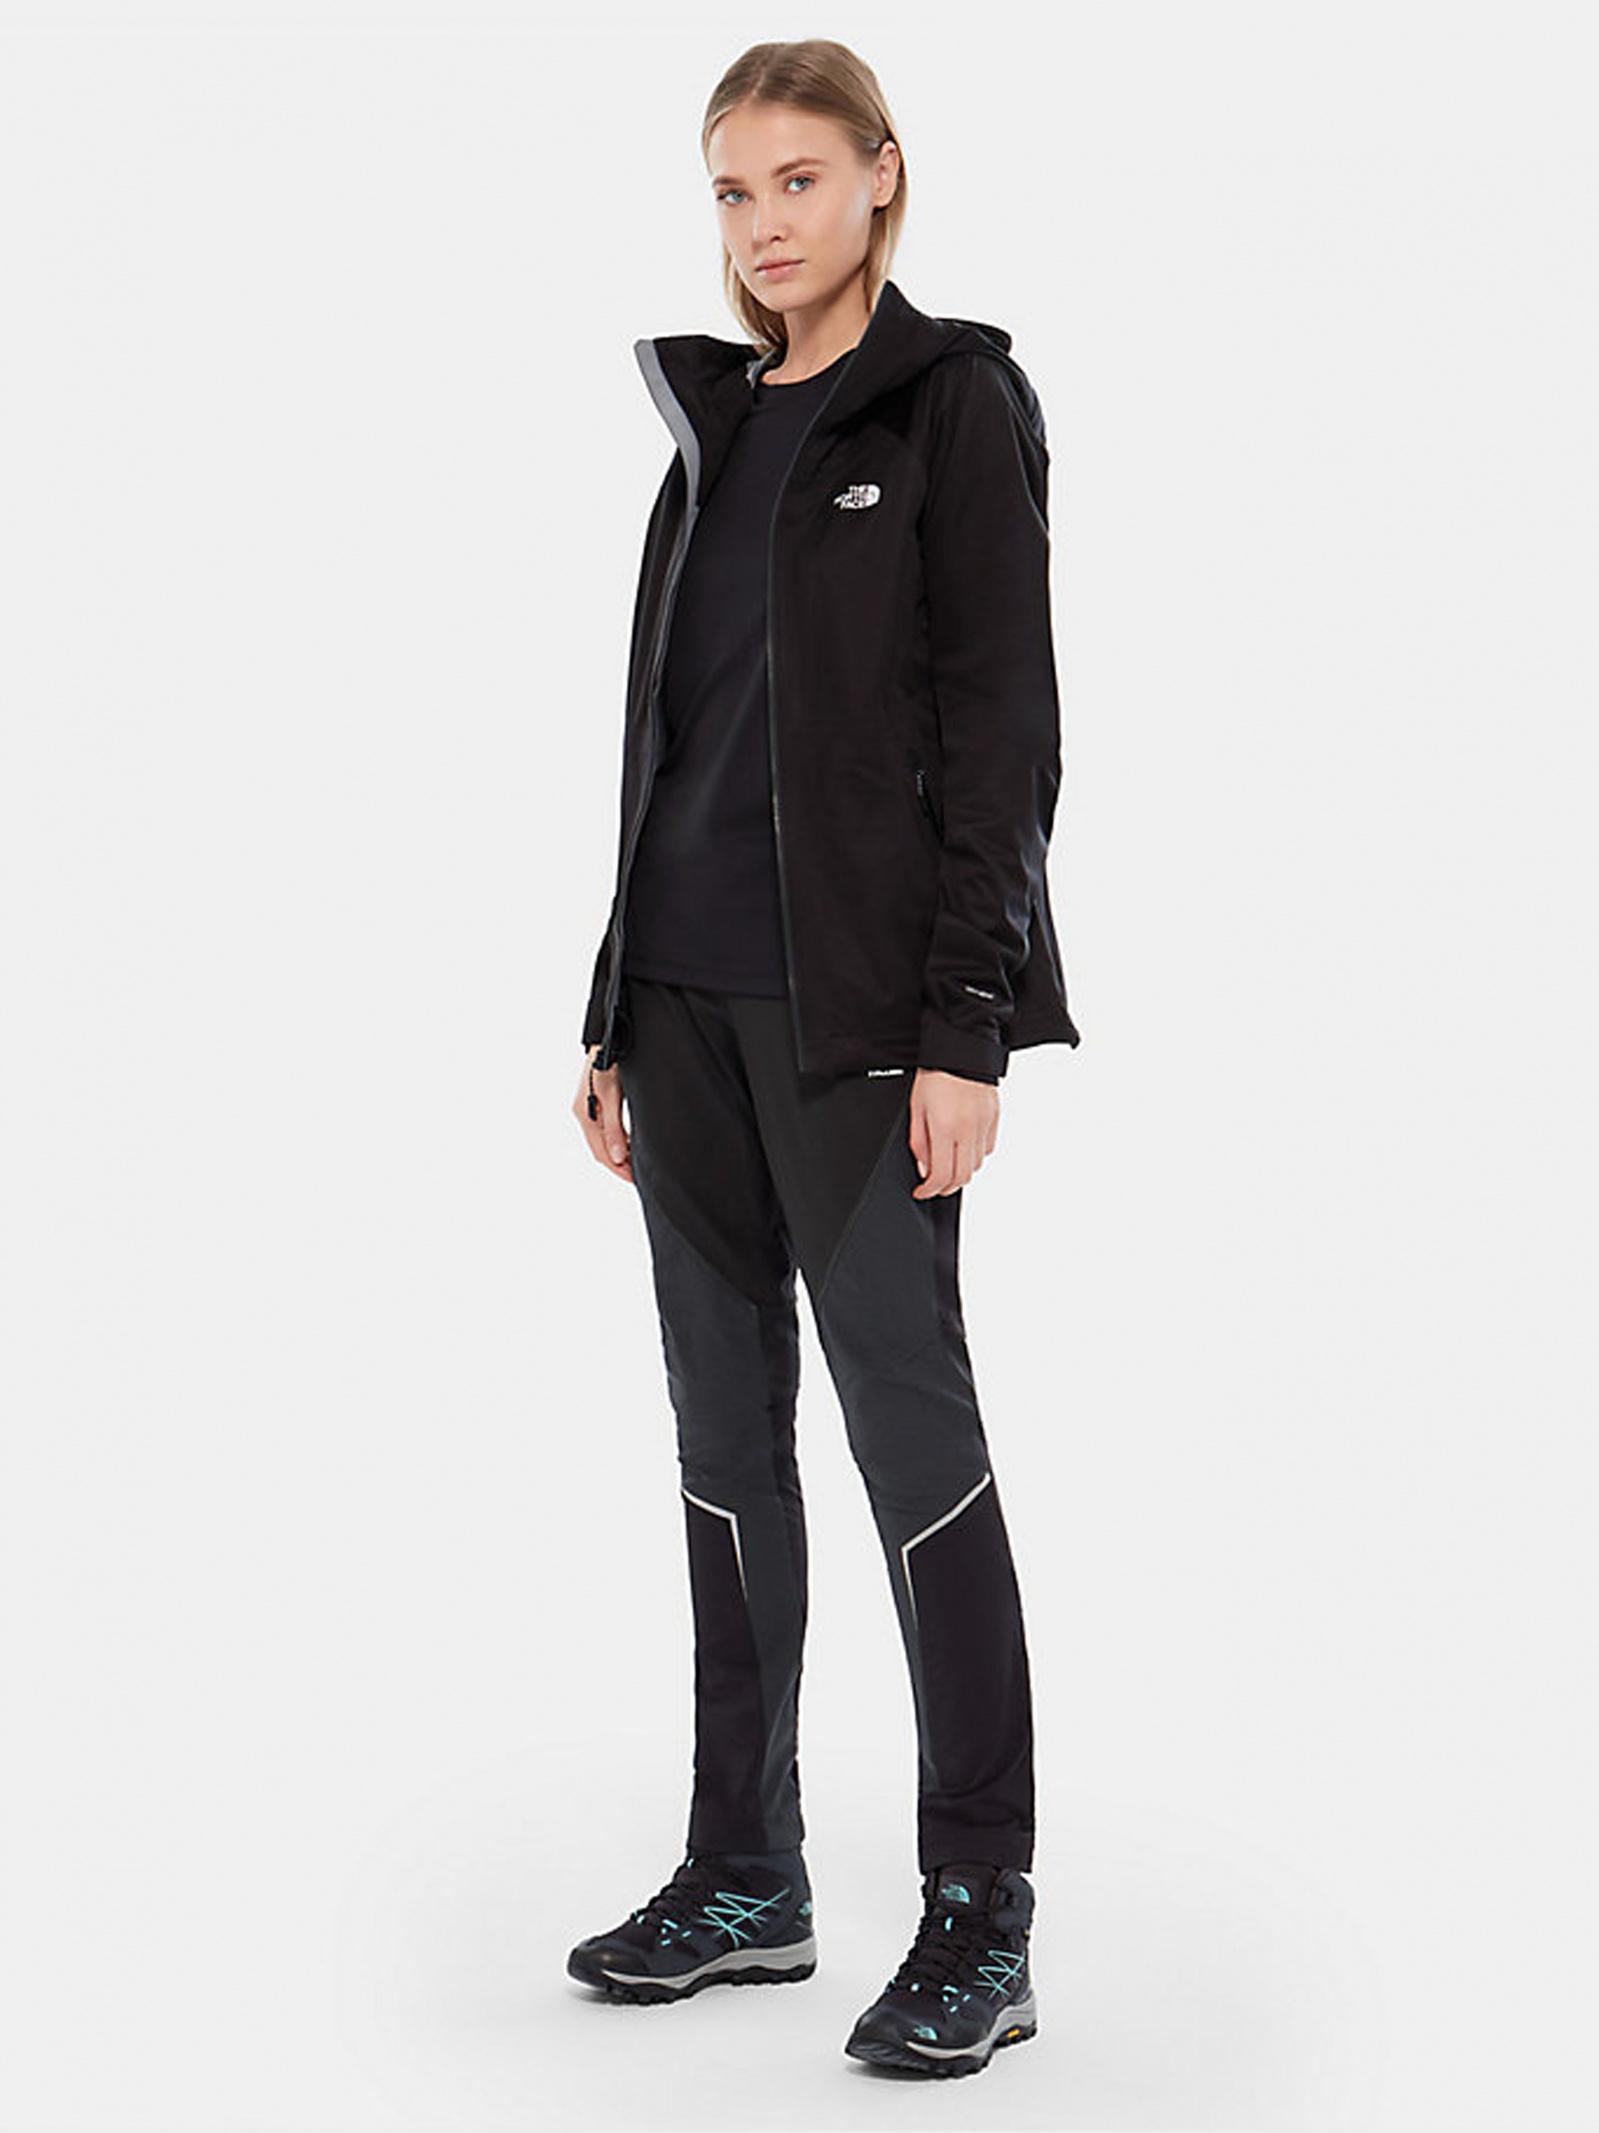 Кофты и свитера женские The North Face модель NF0A3UWMJK31 приобрести, 2017